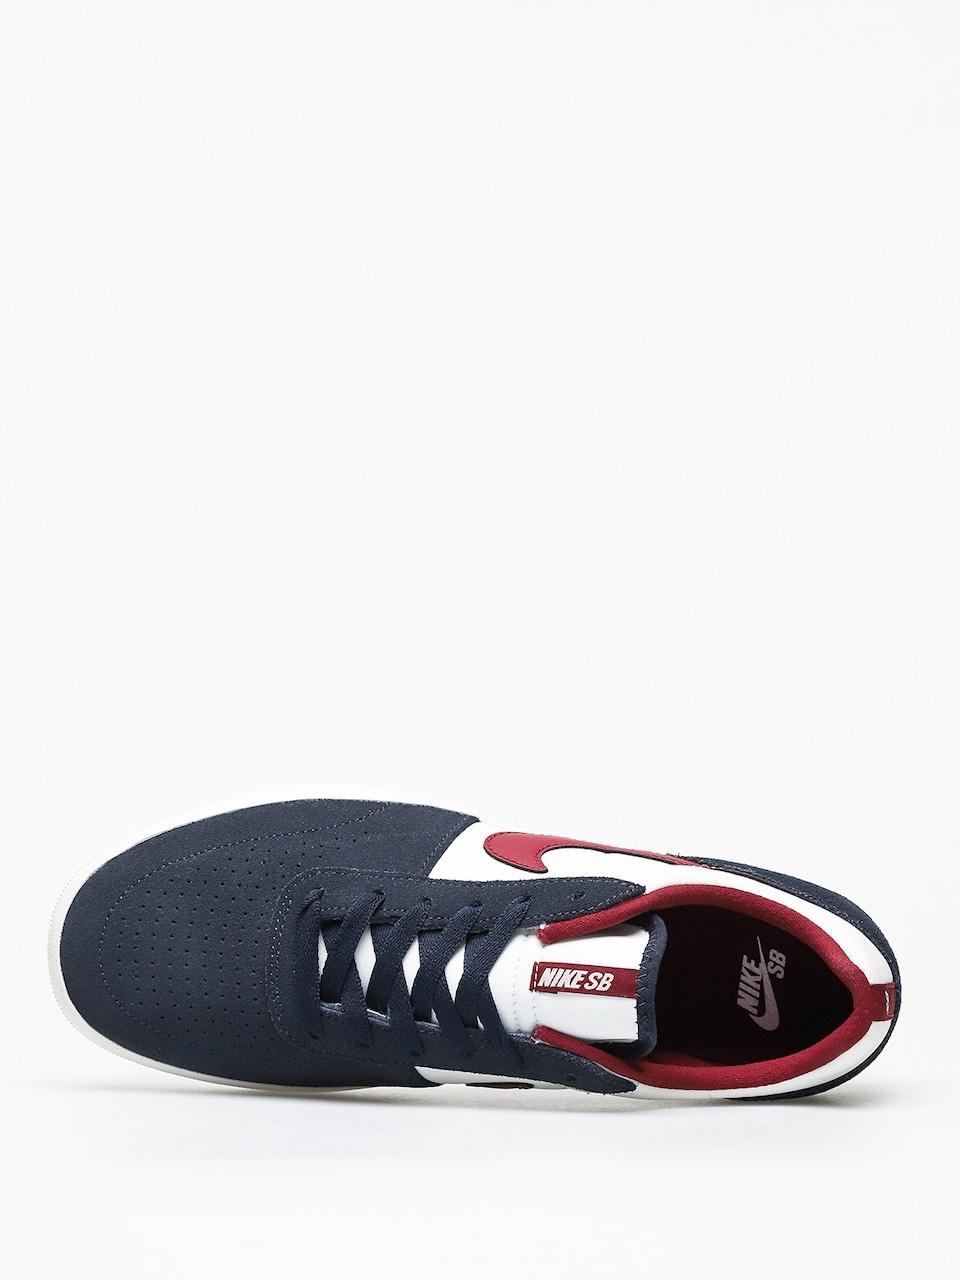 Buty Nike SB Team Classic (obsidianteam red summit white)